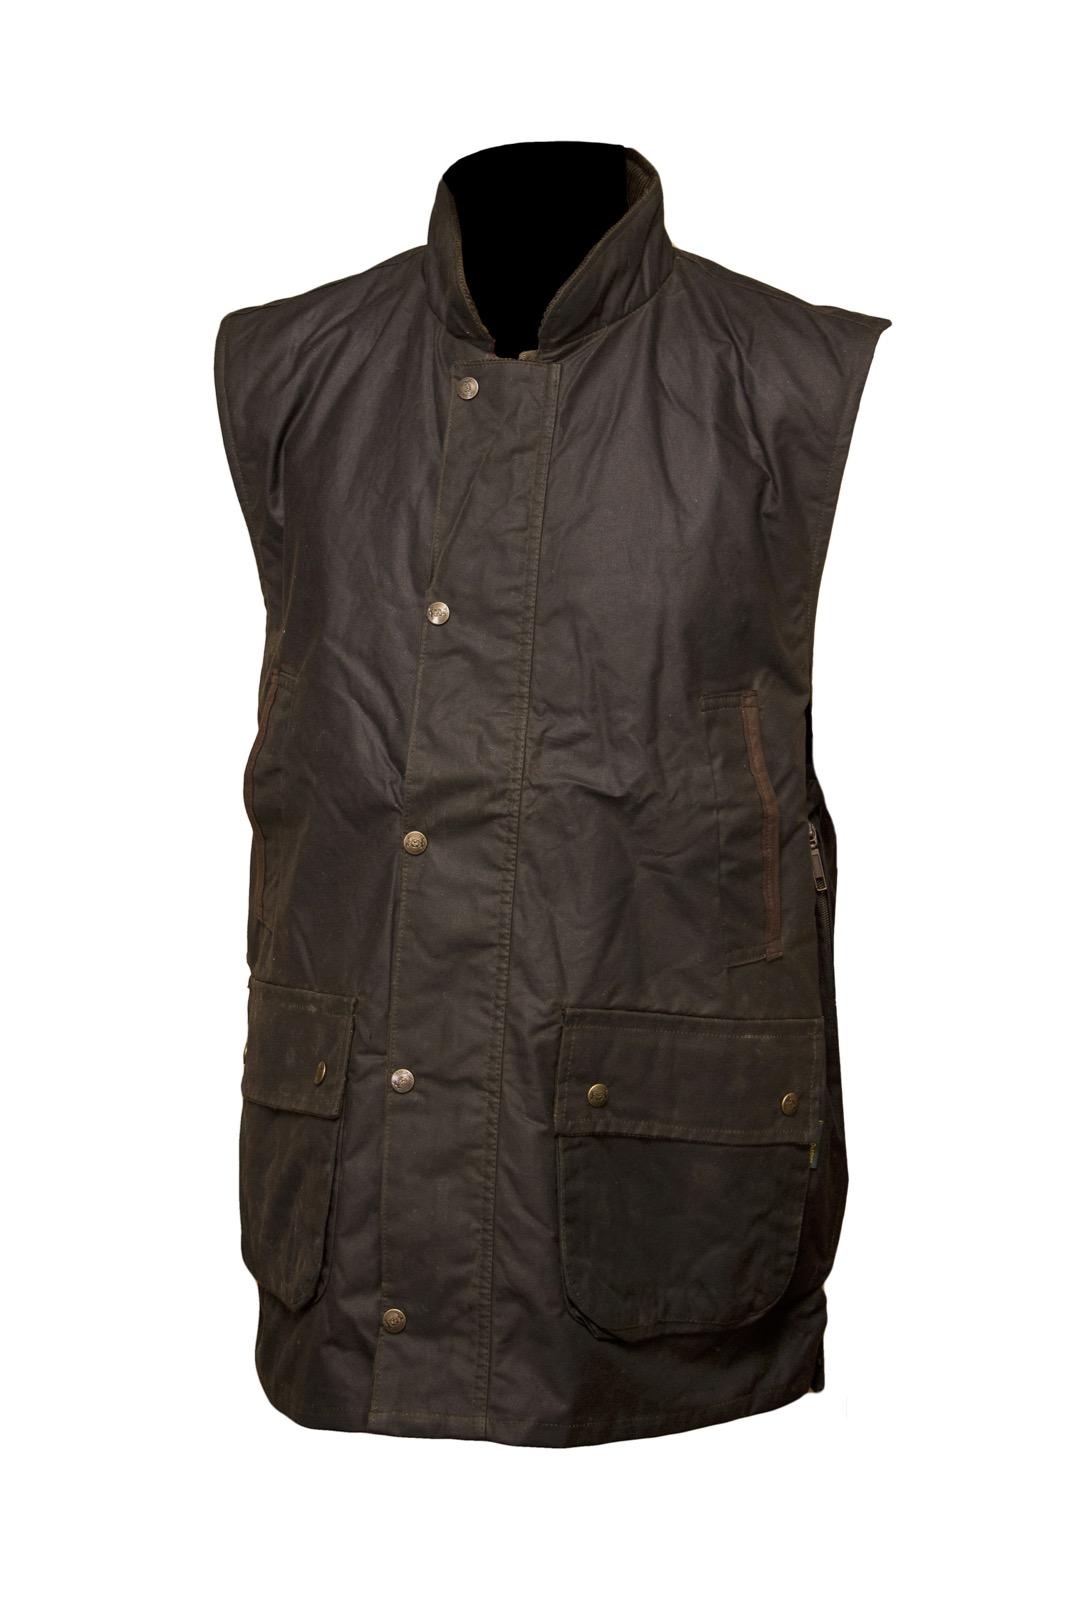 new hunter outdoor wax shooting body warmer waistcoat. Black Bedroom Furniture Sets. Home Design Ideas